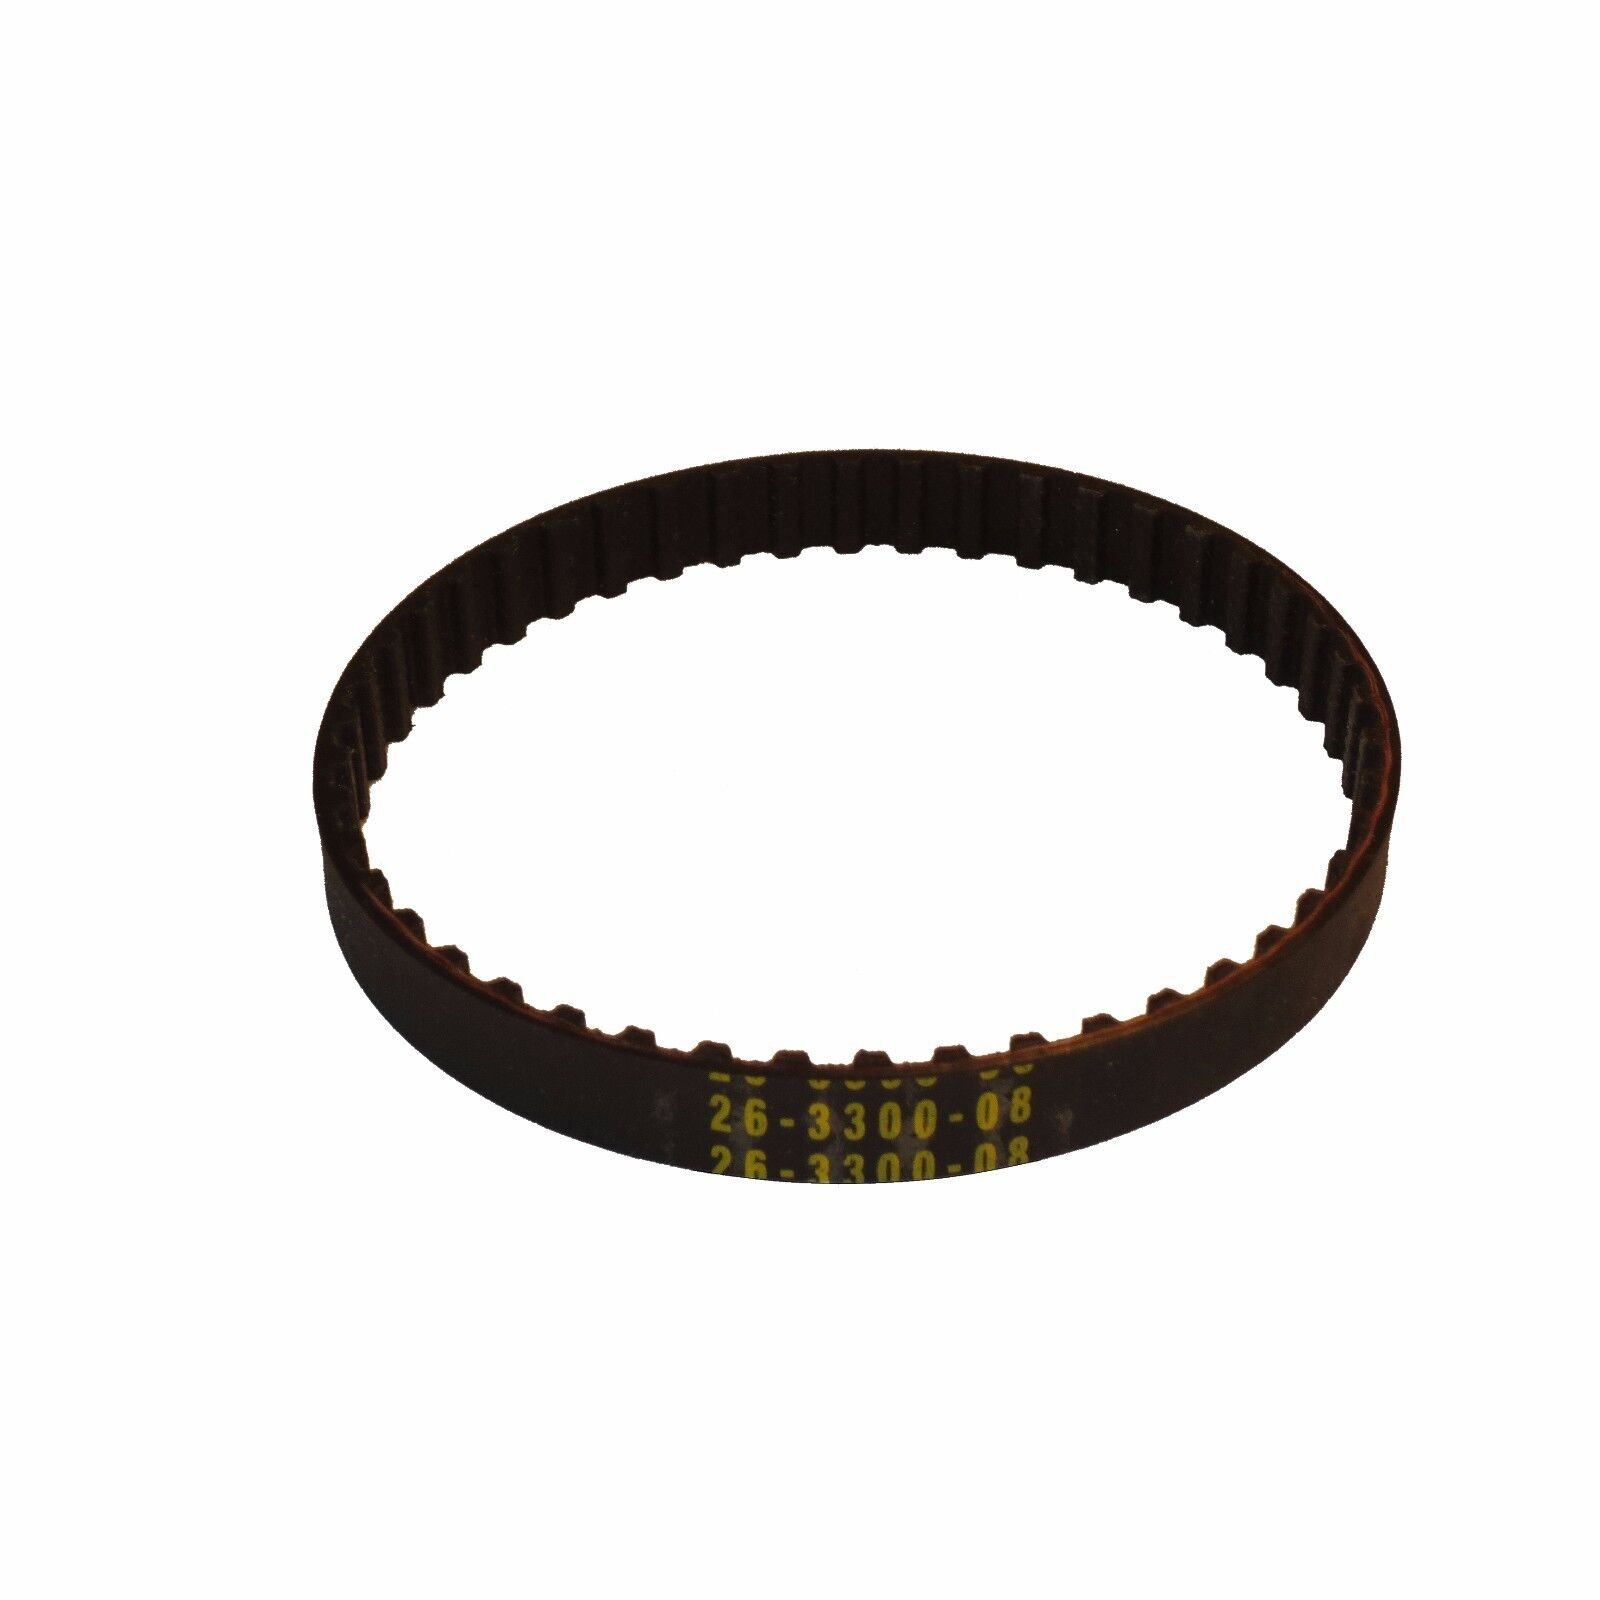 Electrolux PN1 PN2 PN3 PN4 Narrow Cleaner Canister Power Nozzle Belts 8 Belts